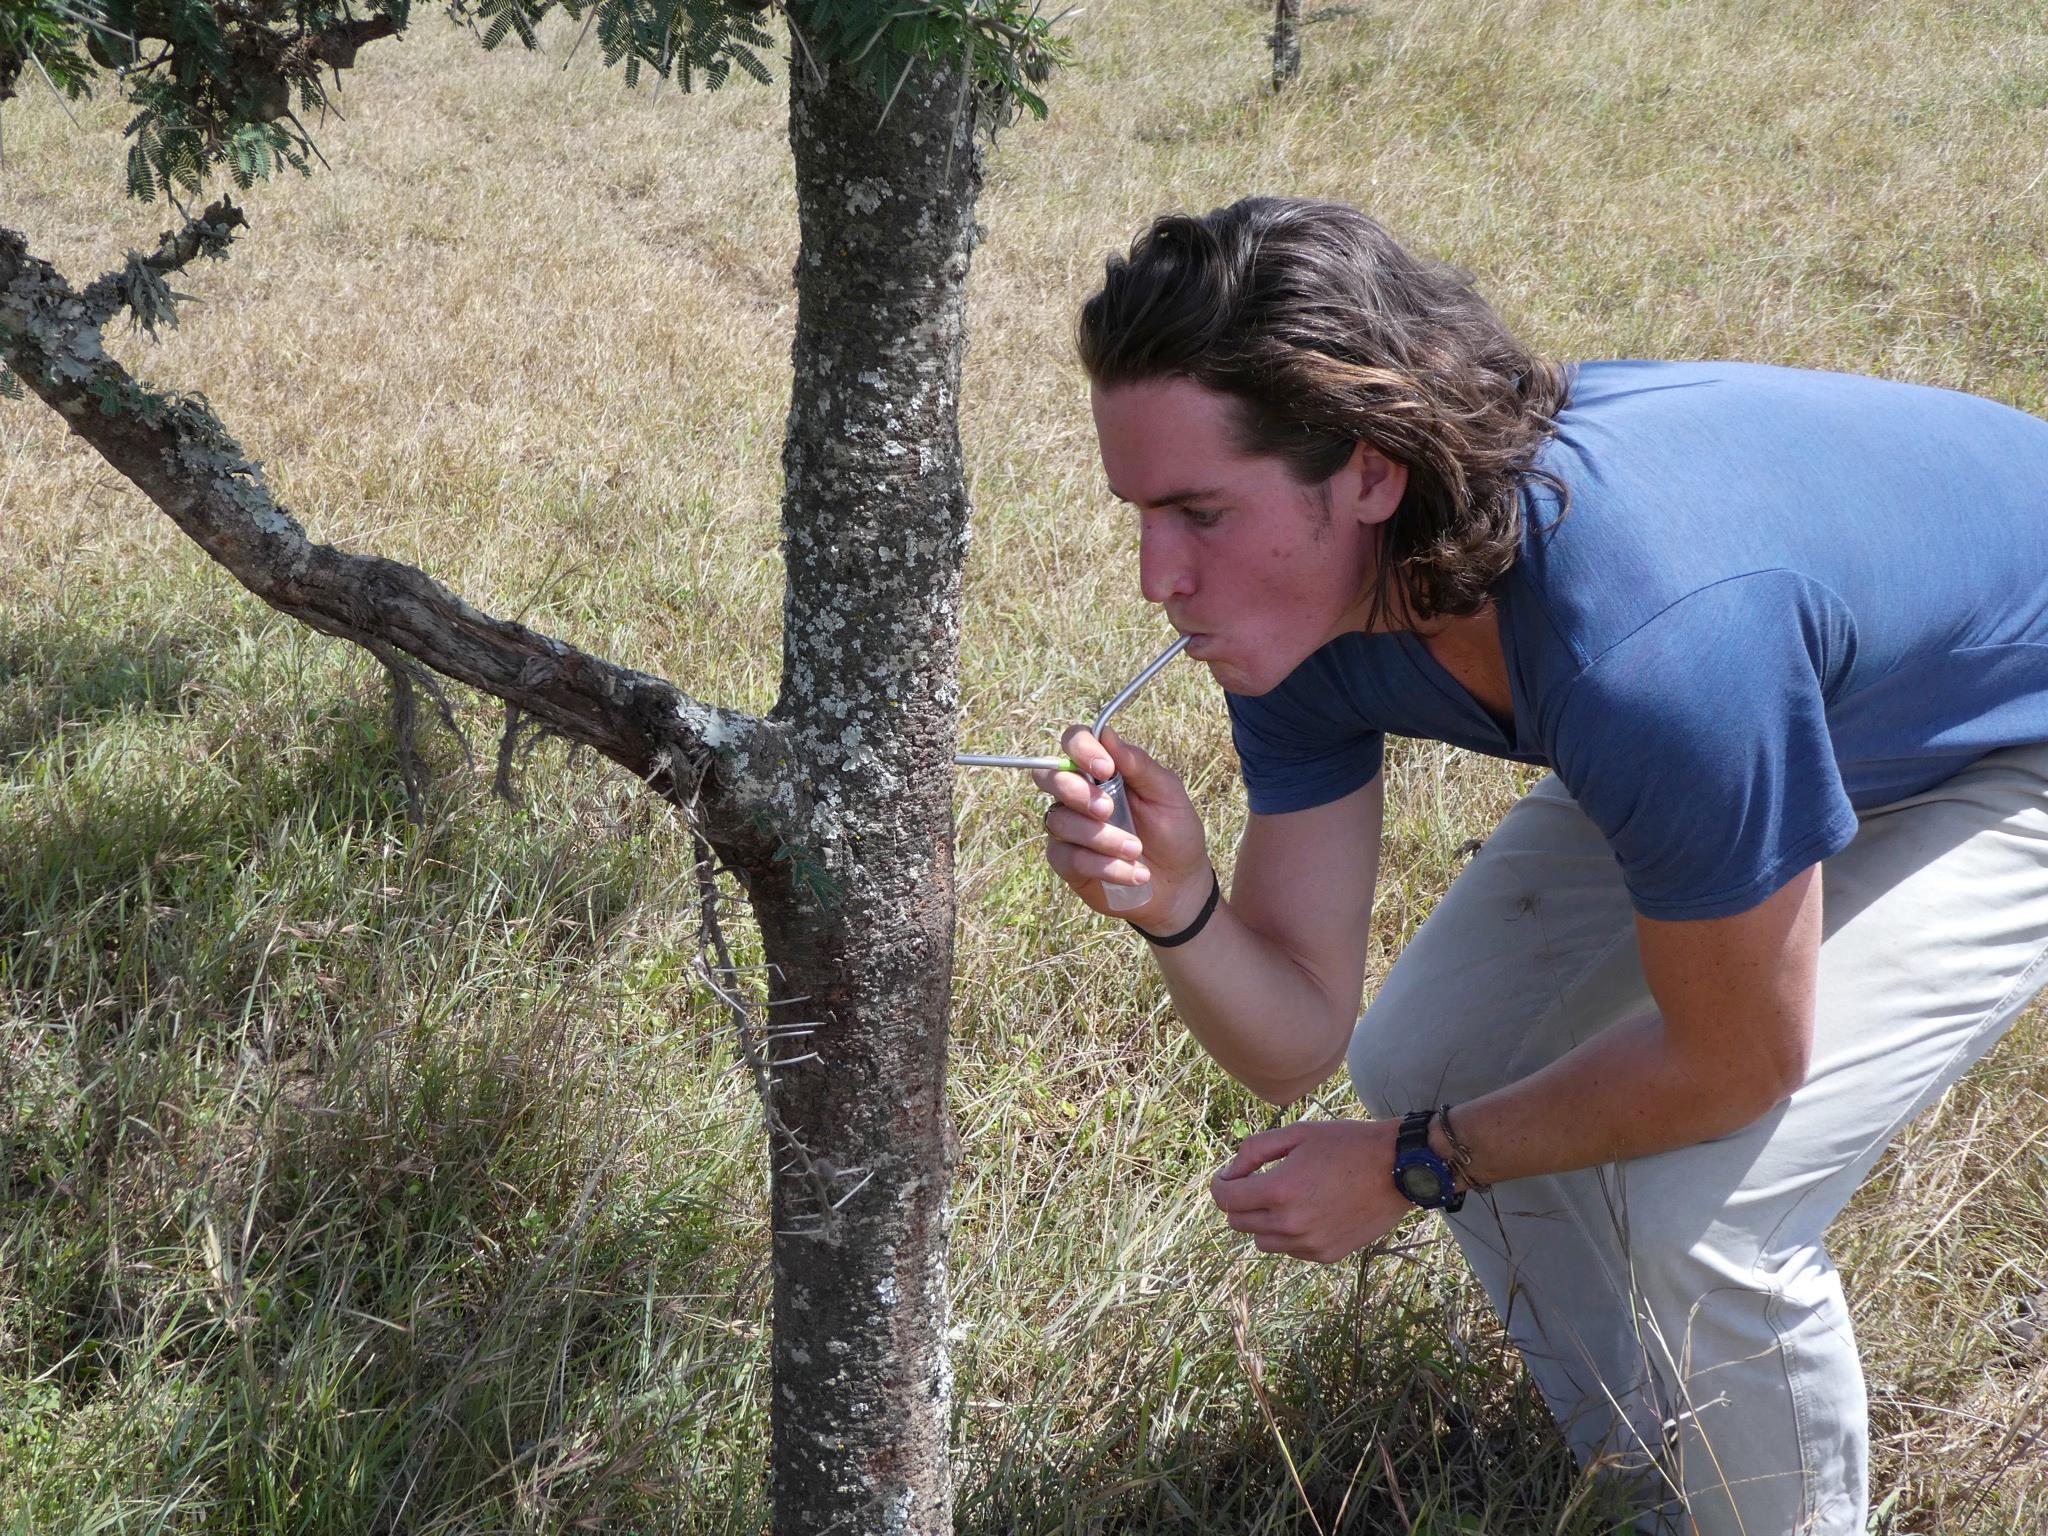 Collecting specimens of invasive  Pheidole megacephala